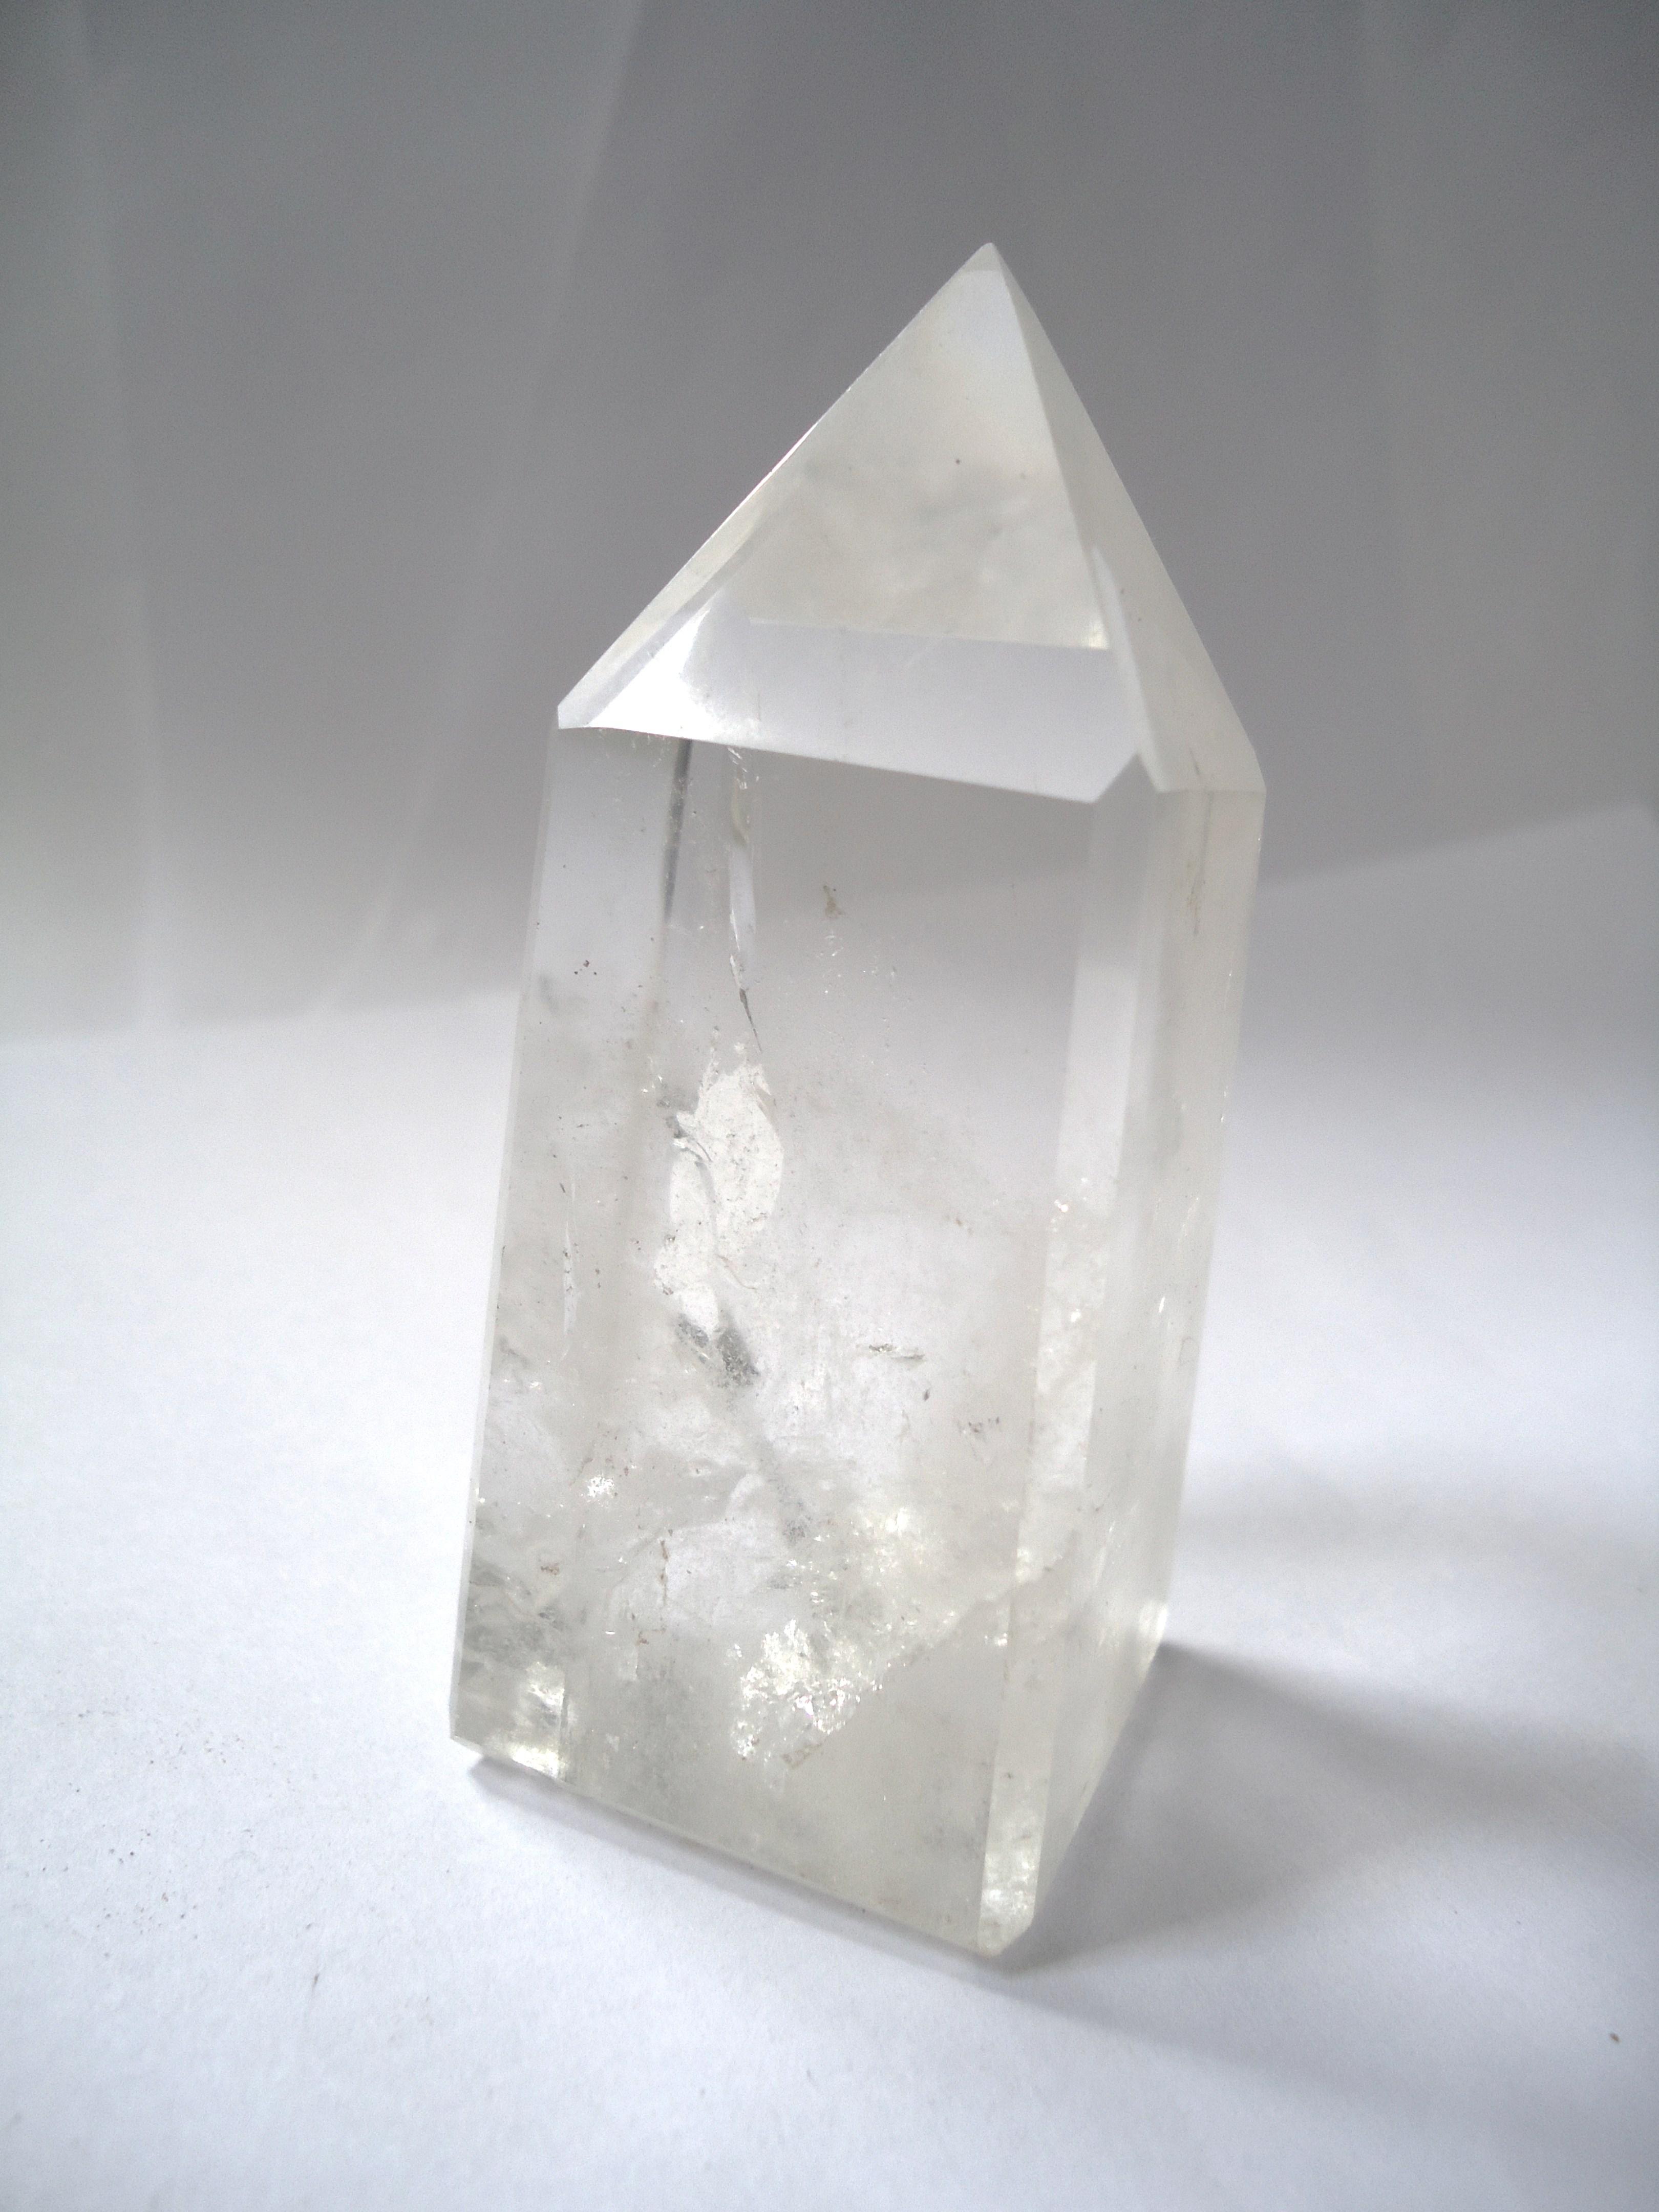 Decorative Quartz Rocks Filelapidated Quartz Rock Crystal Obeliskjpg Wikimedia Commons